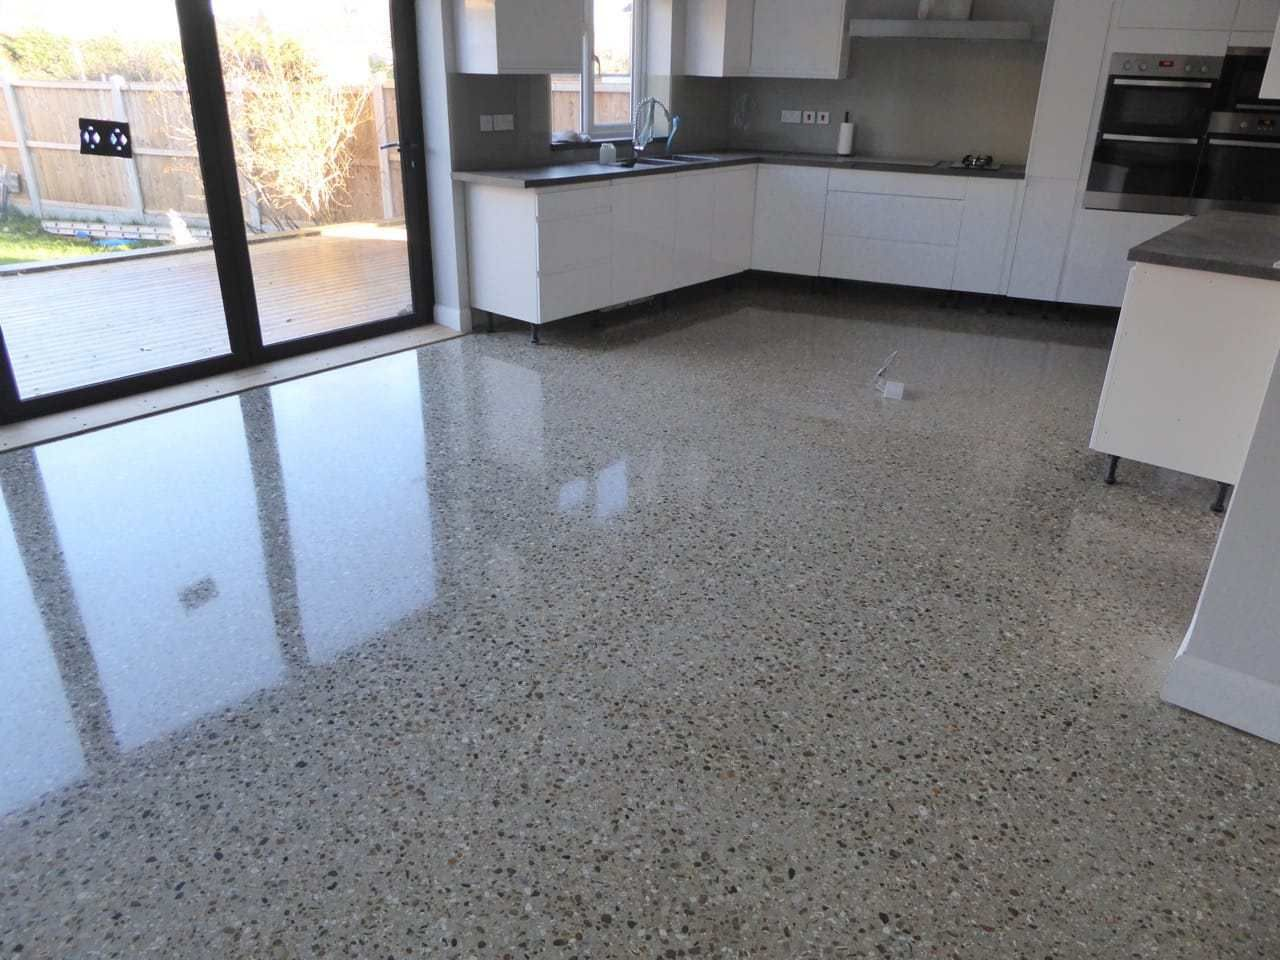 Polished Concrete Floors   Polished Concrete   Pinterest ...